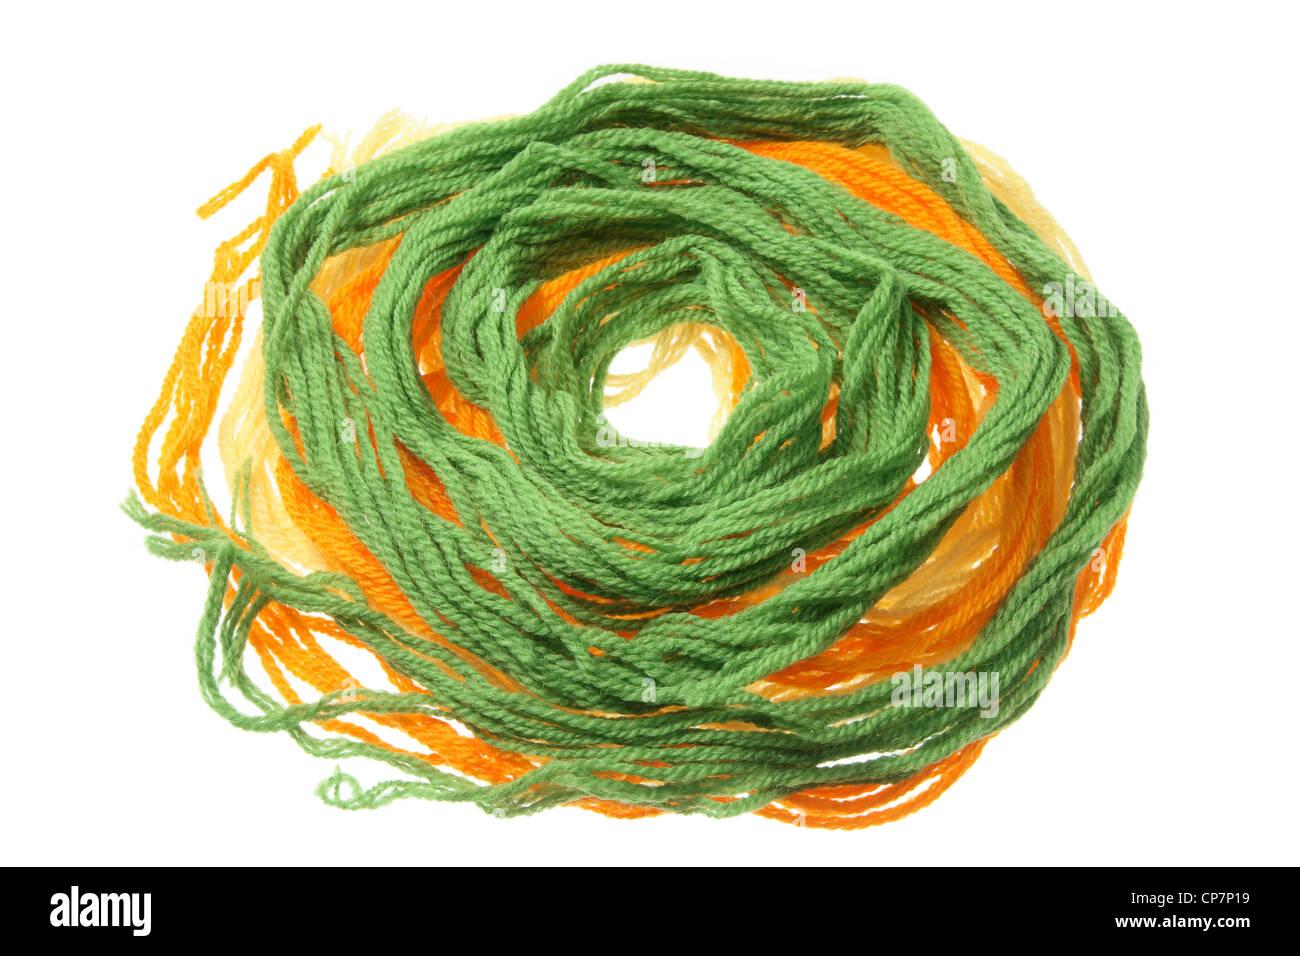 Yarn - Stock Image